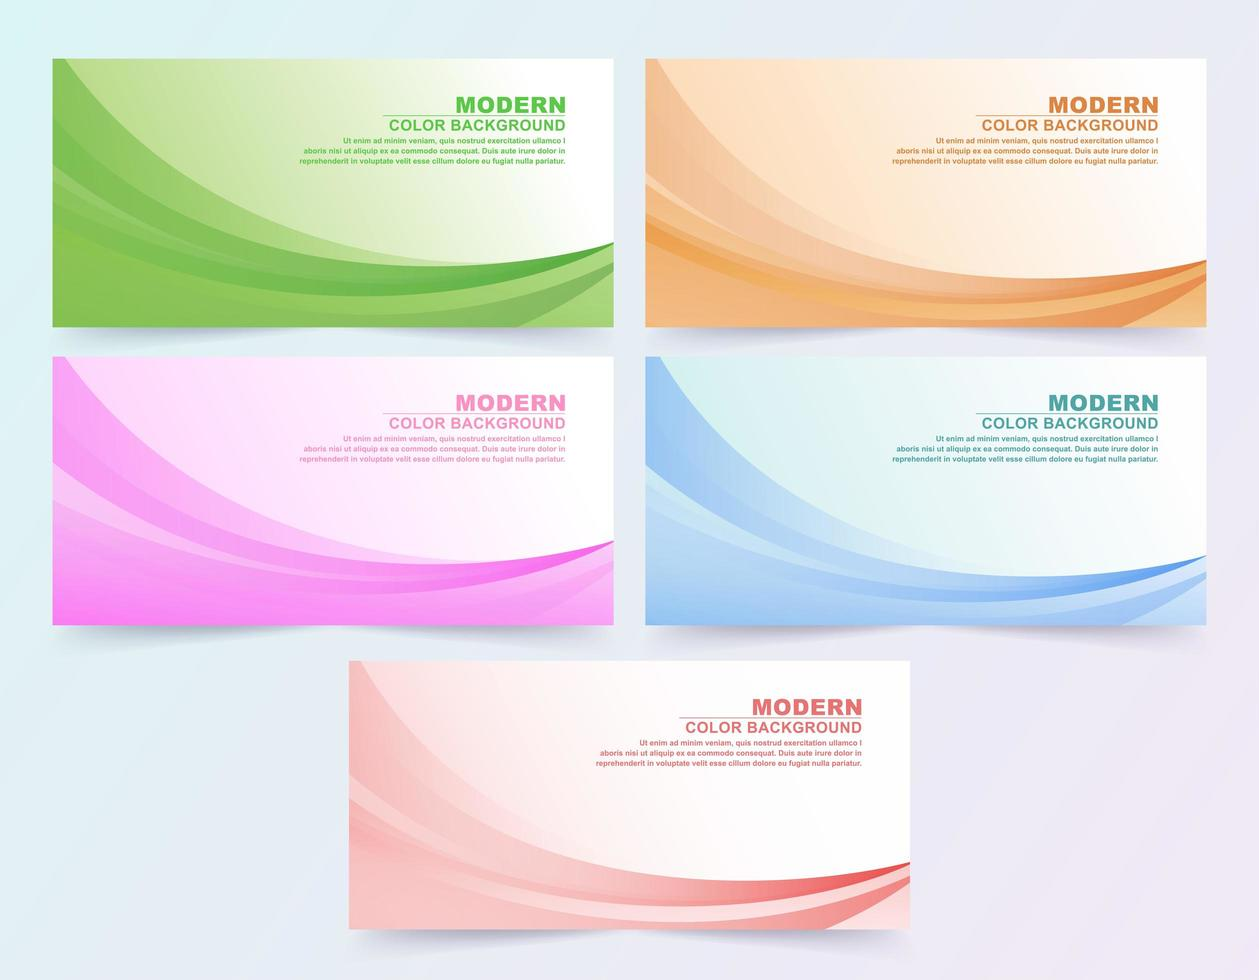 gran se de fondo de estilo de negocios ondulado colorido abstracto vector